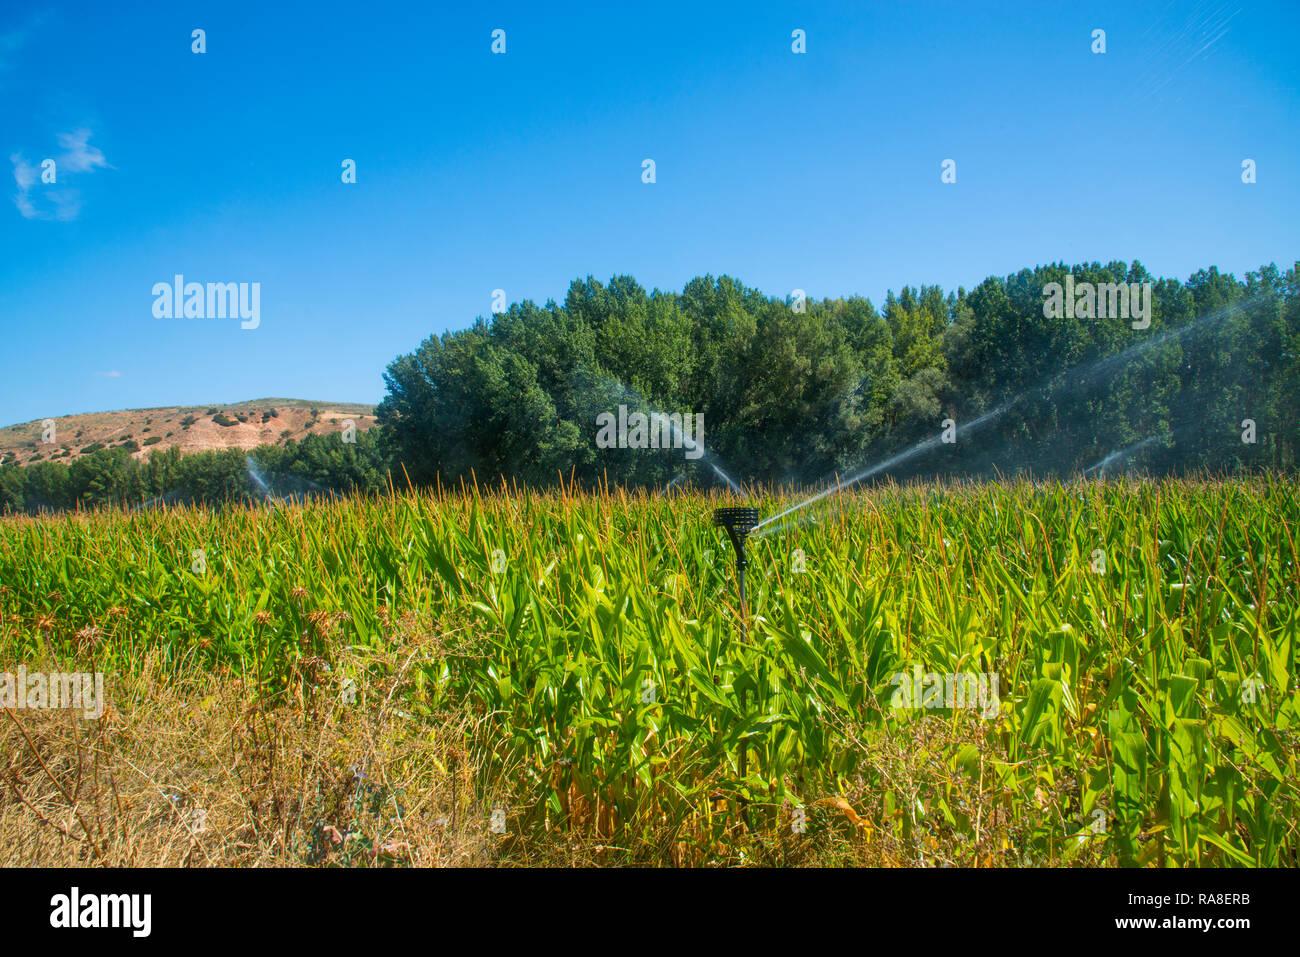 Irrigation system in corn field. La Alcarria, Guadalajara, Spain. - Stock Image